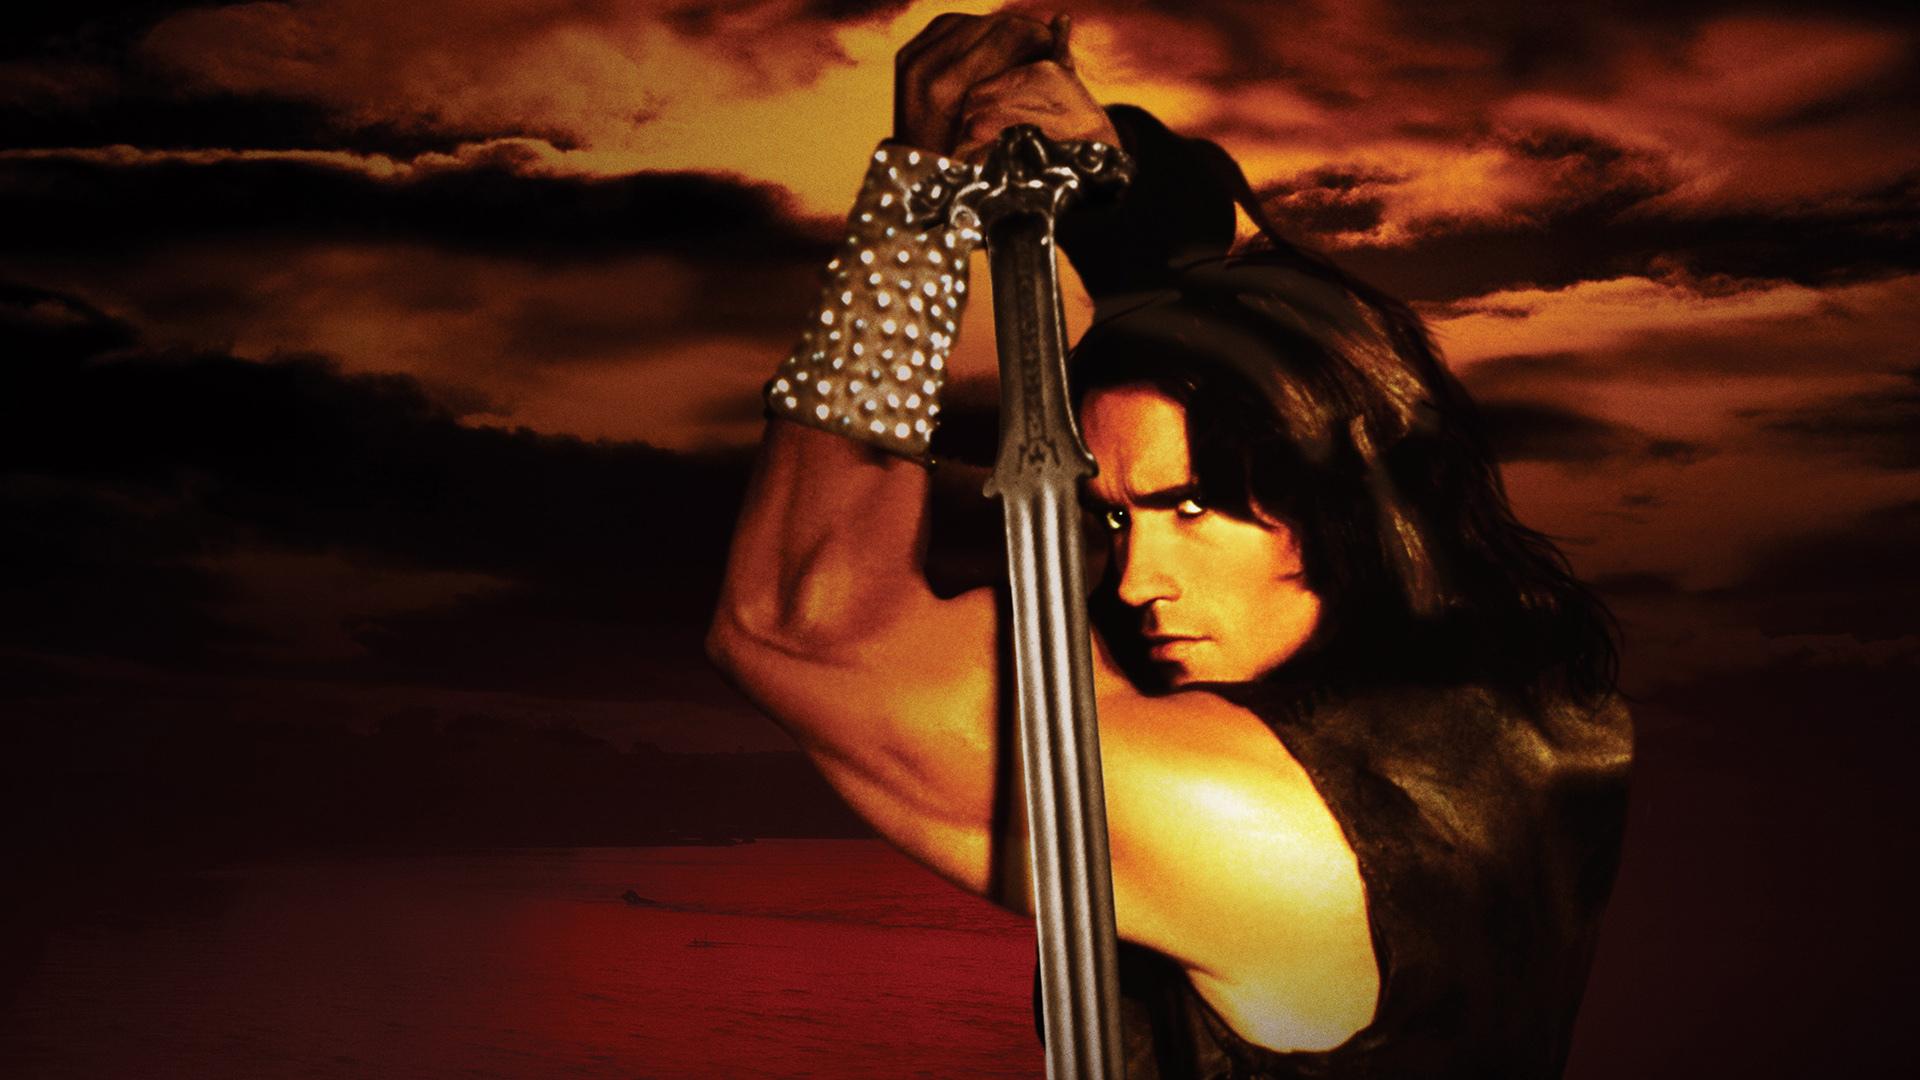 Conan the Barbarian Blu-ray: International Cut Conan the barbarian pictures